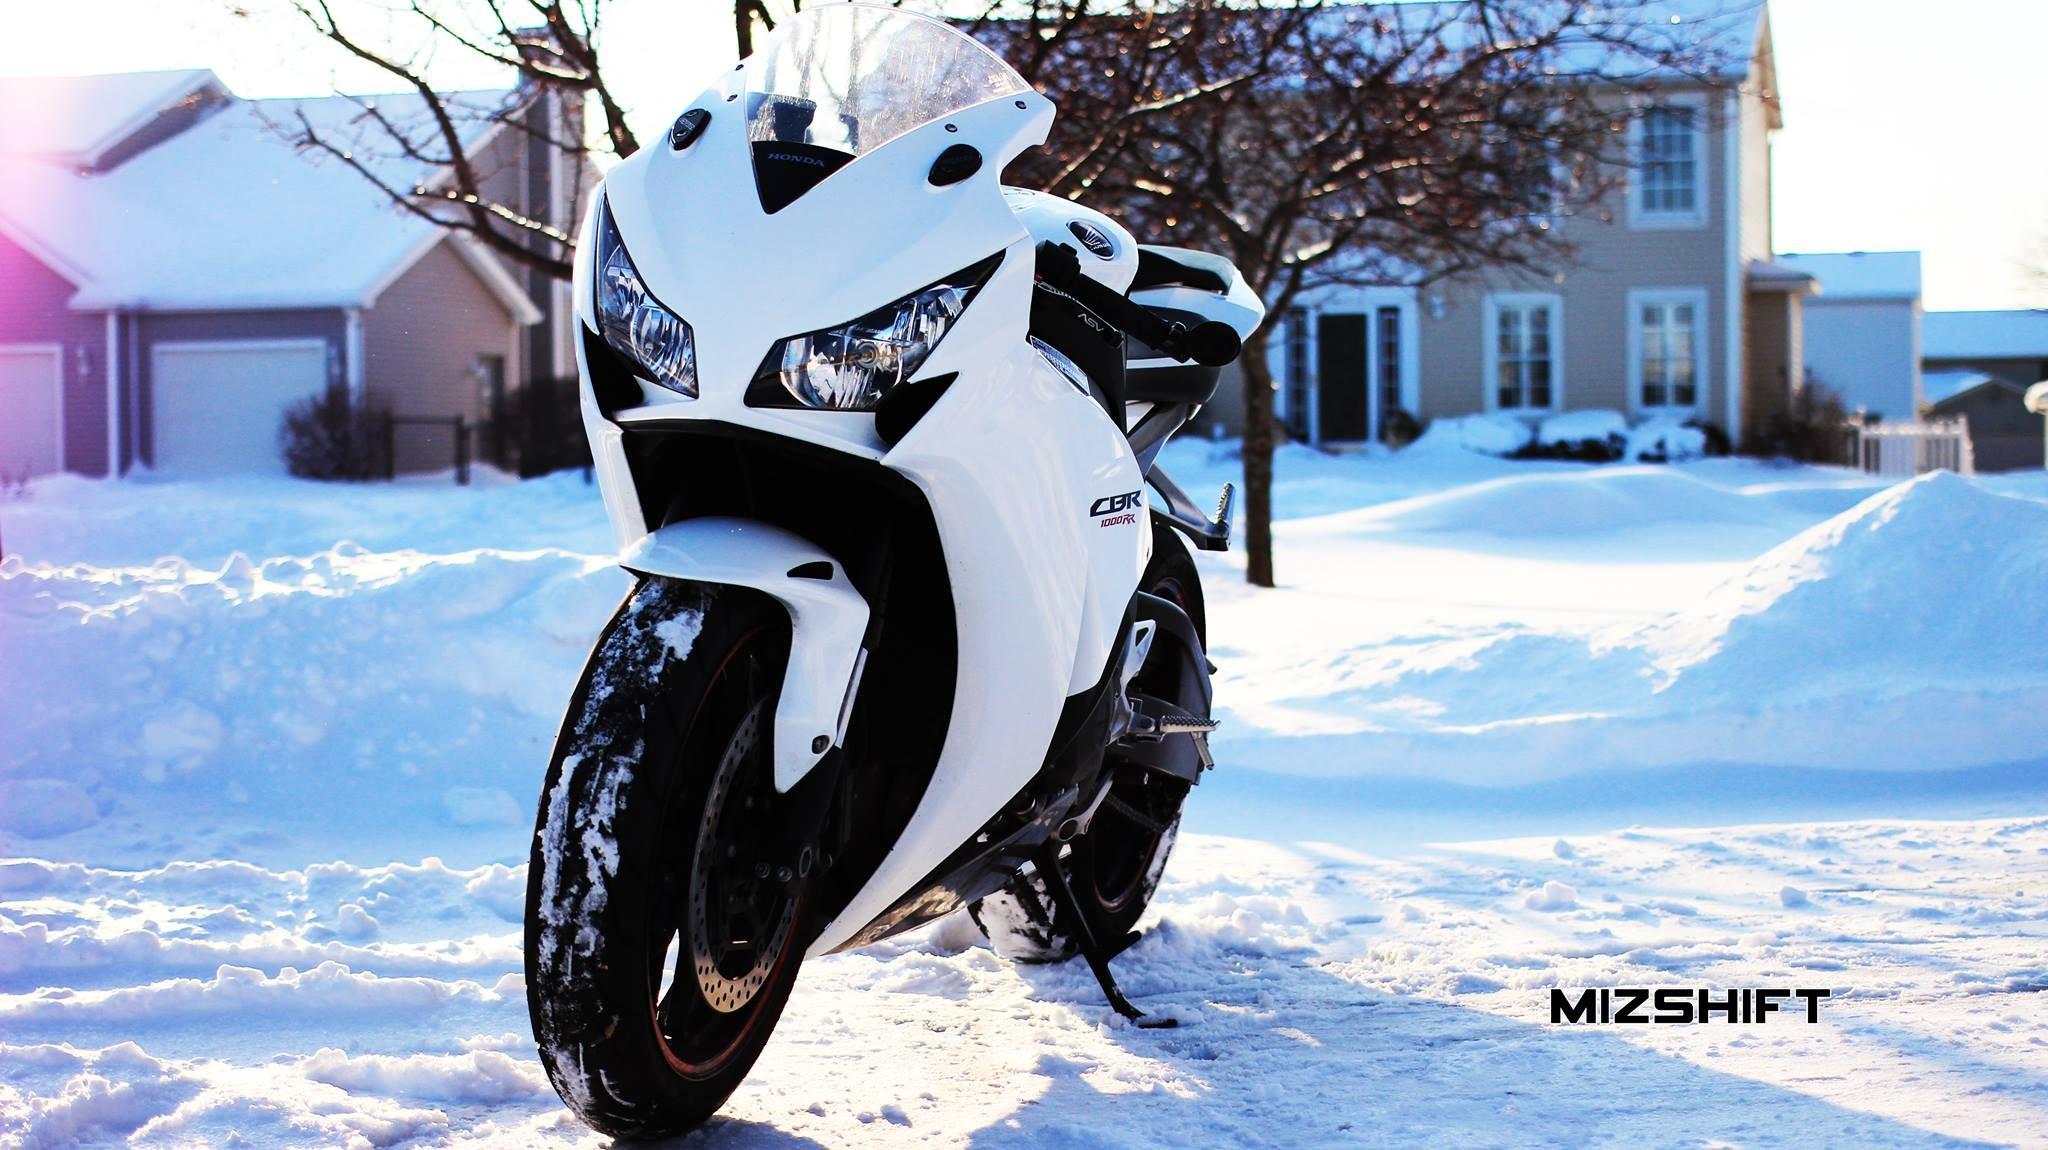 могло зима мотоцикл картинки персонажей заимствованы знаменитых